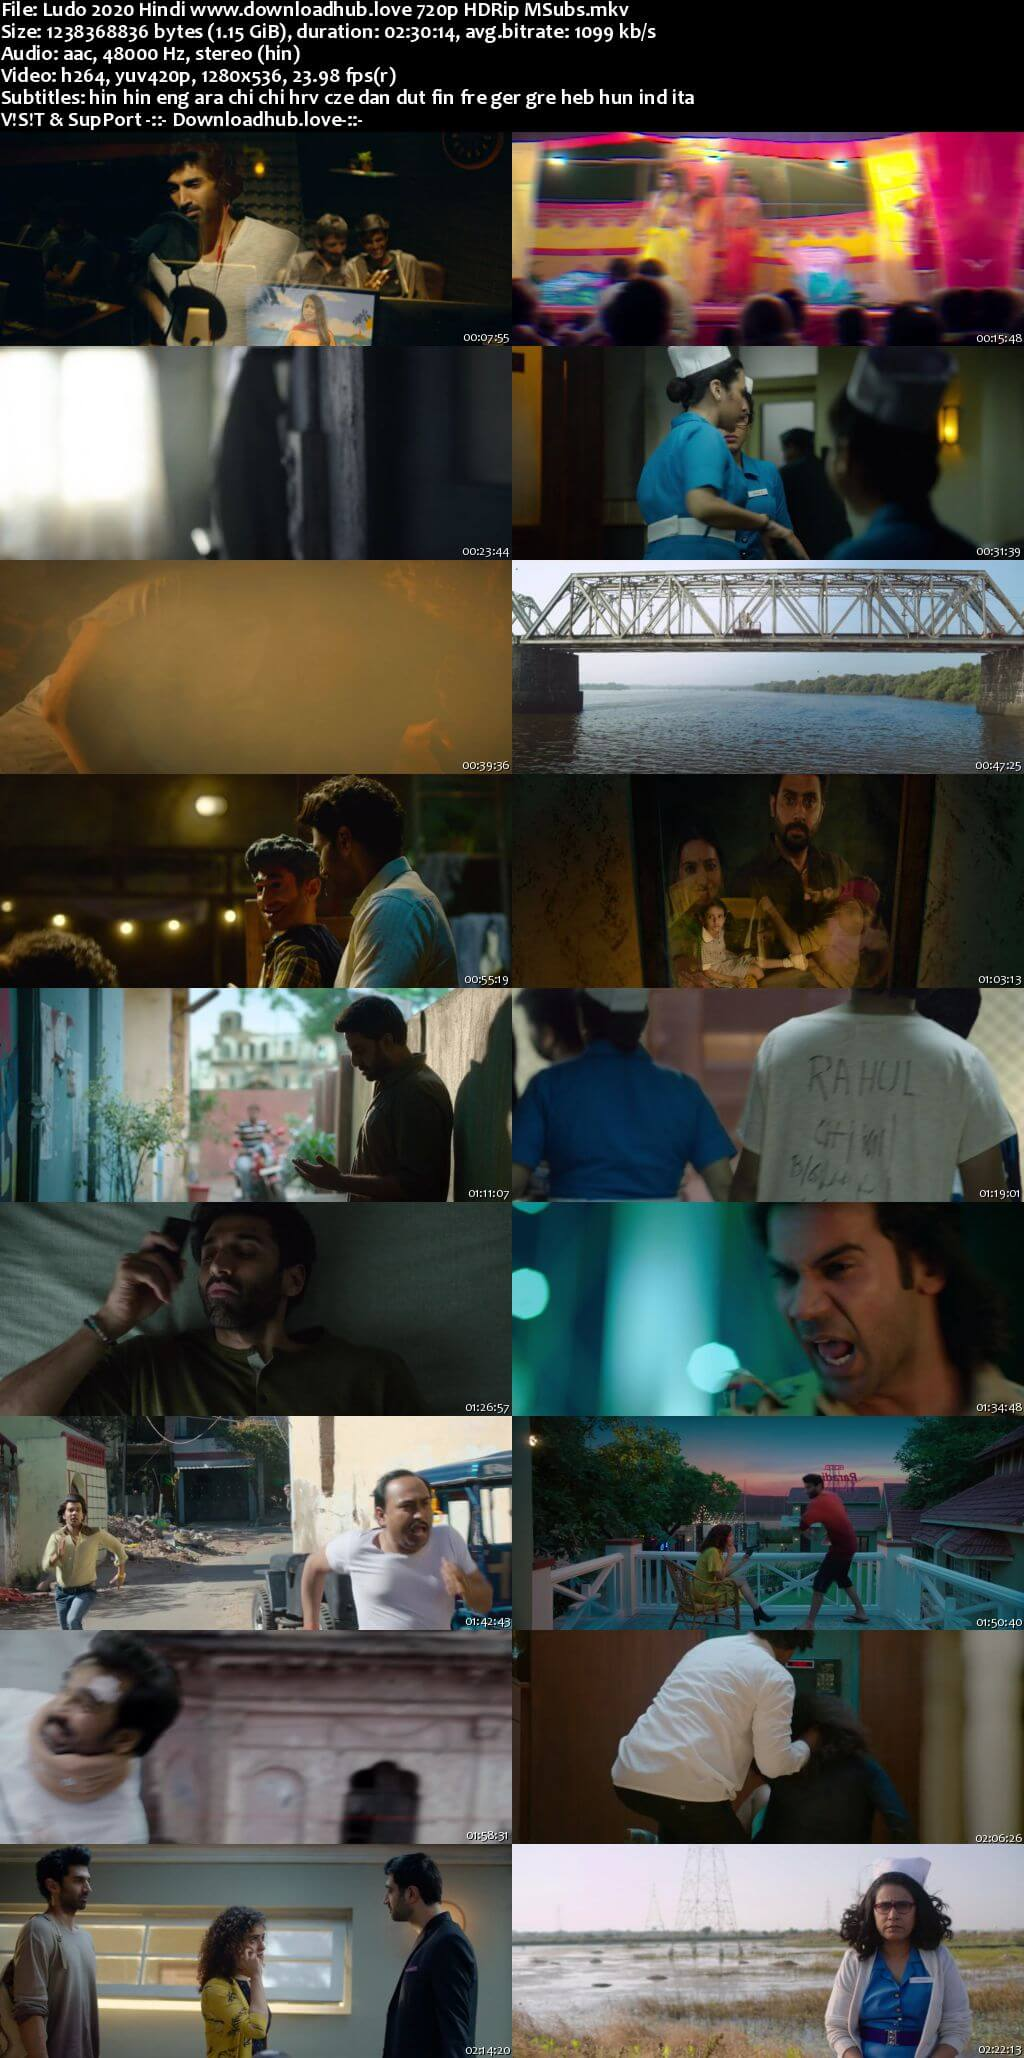 Ludo 2020 Hindi 720p HDRip MSubs